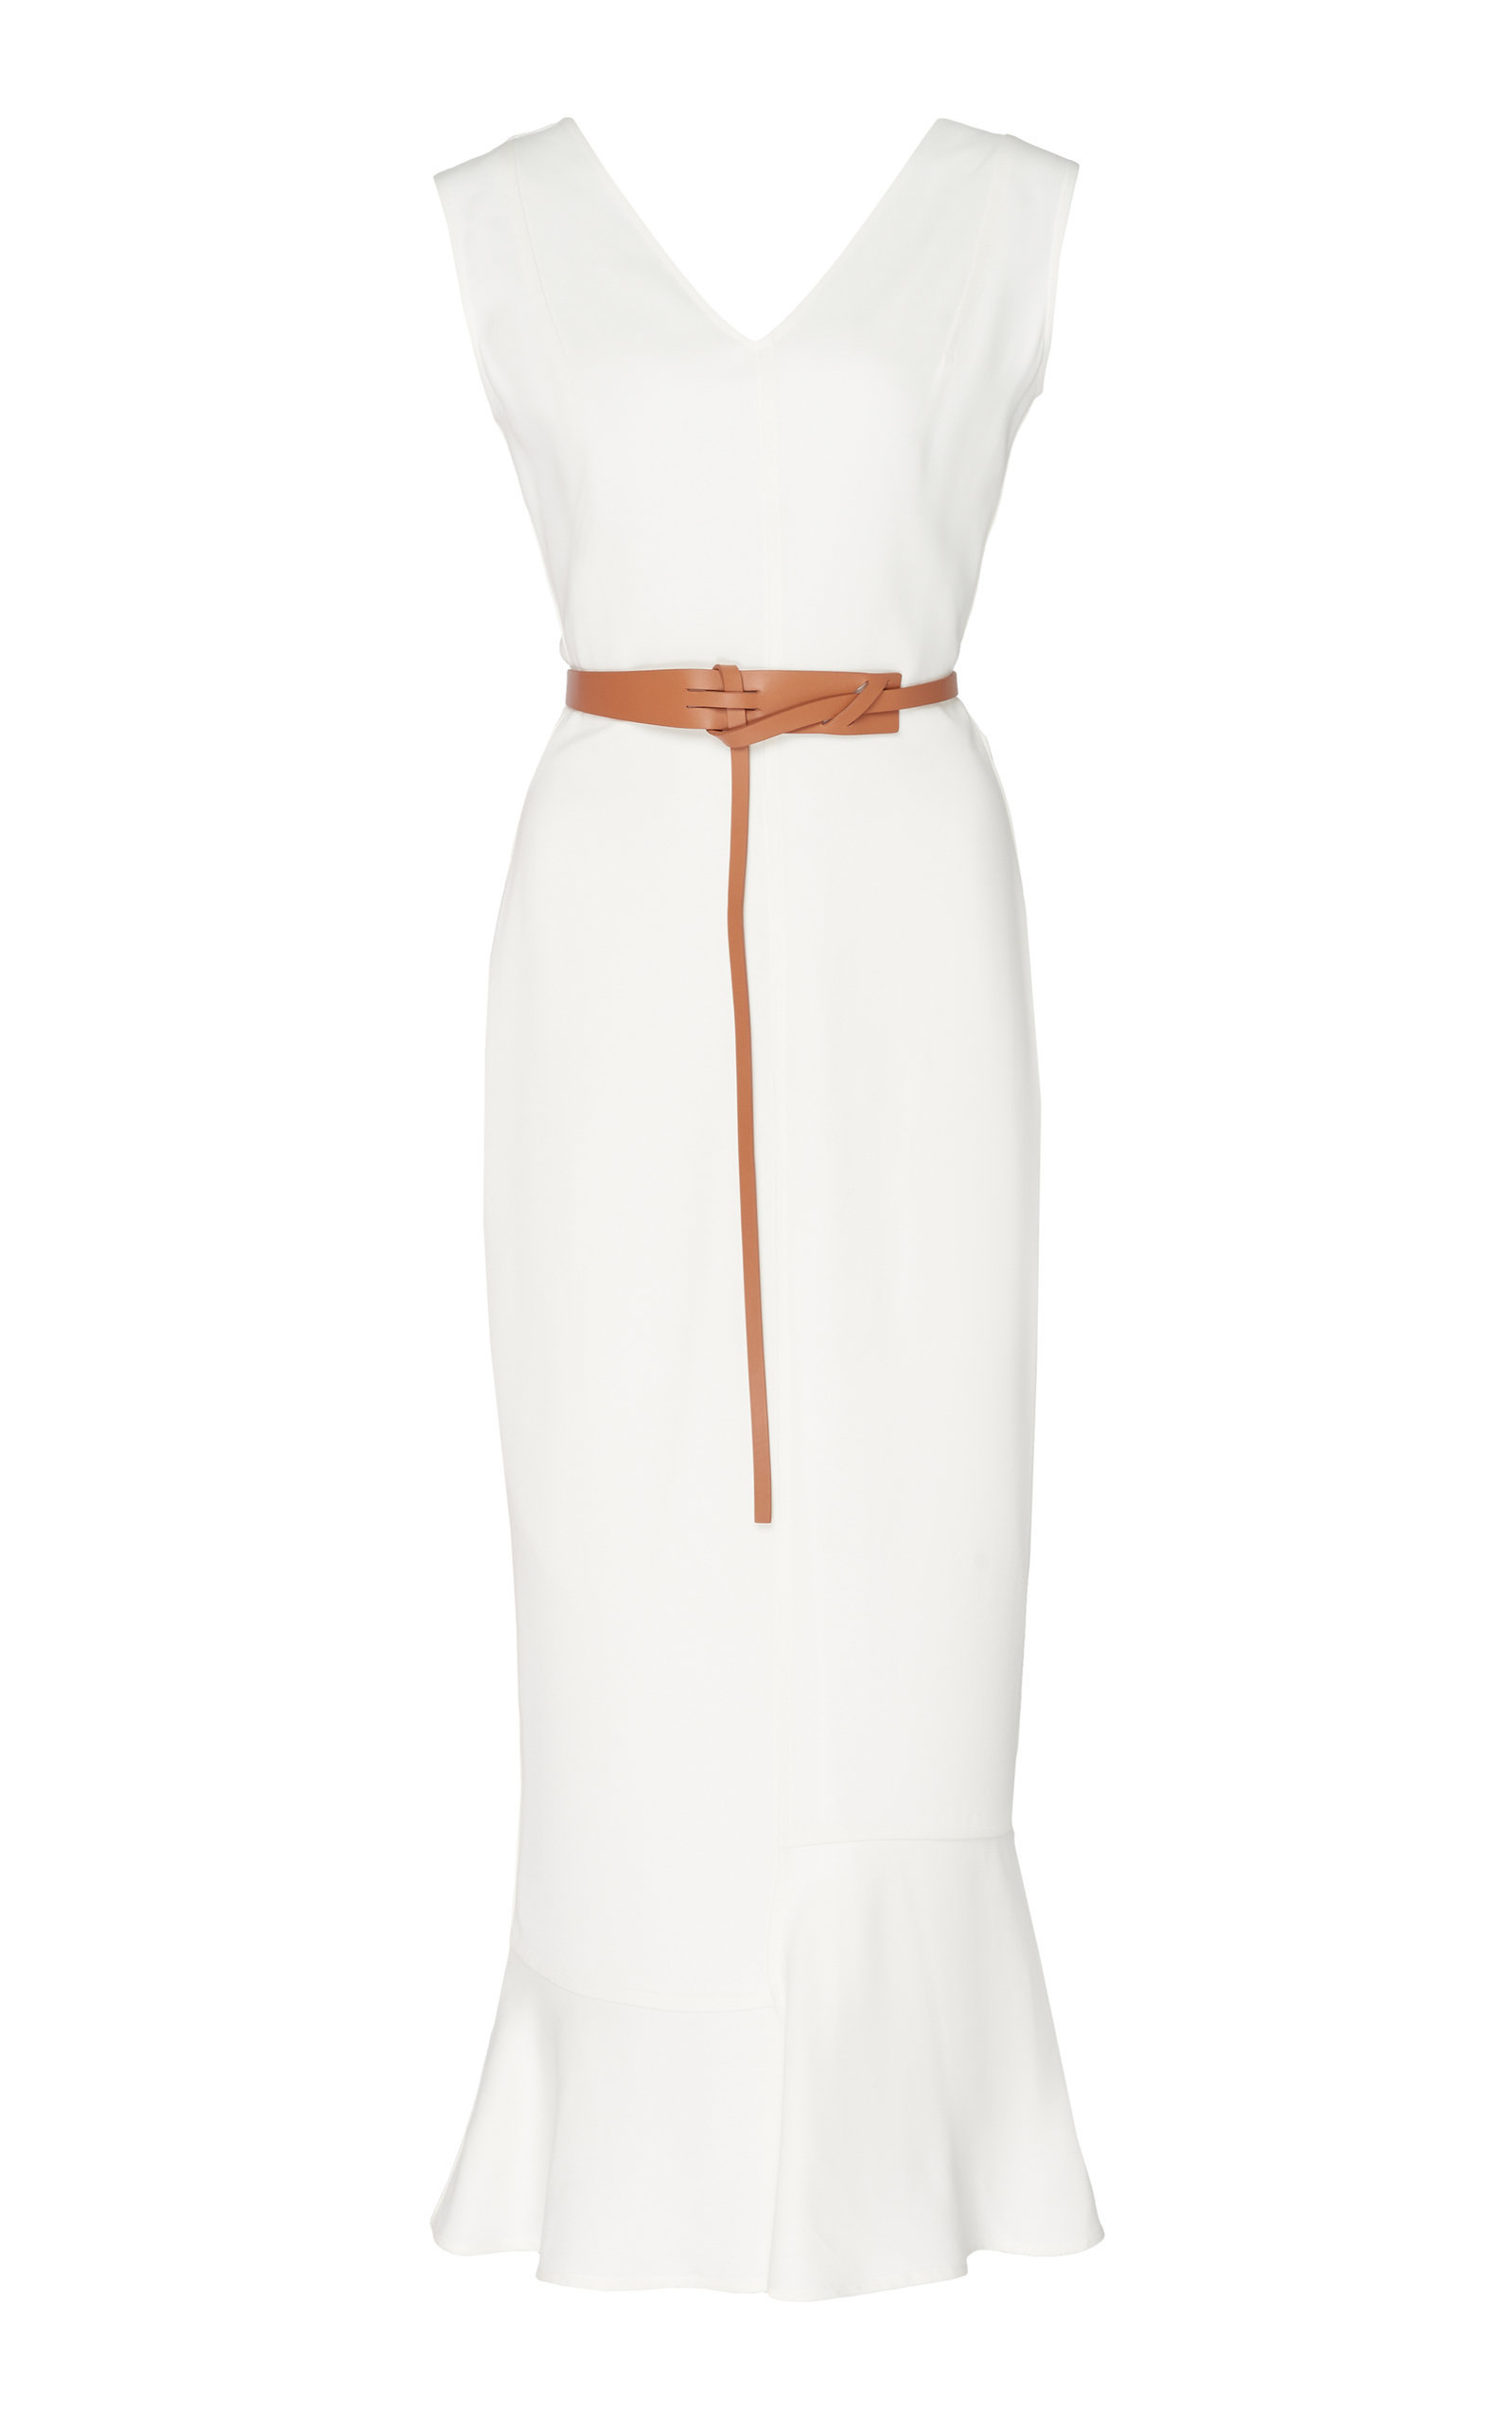 Georgette Frill Hem Midi Dress With Belt By Victoria Beckham For Preorder On Moda Operandi Fashion Midi Dress Classy Charming Dress [ 2560 x 1598 Pixel ]